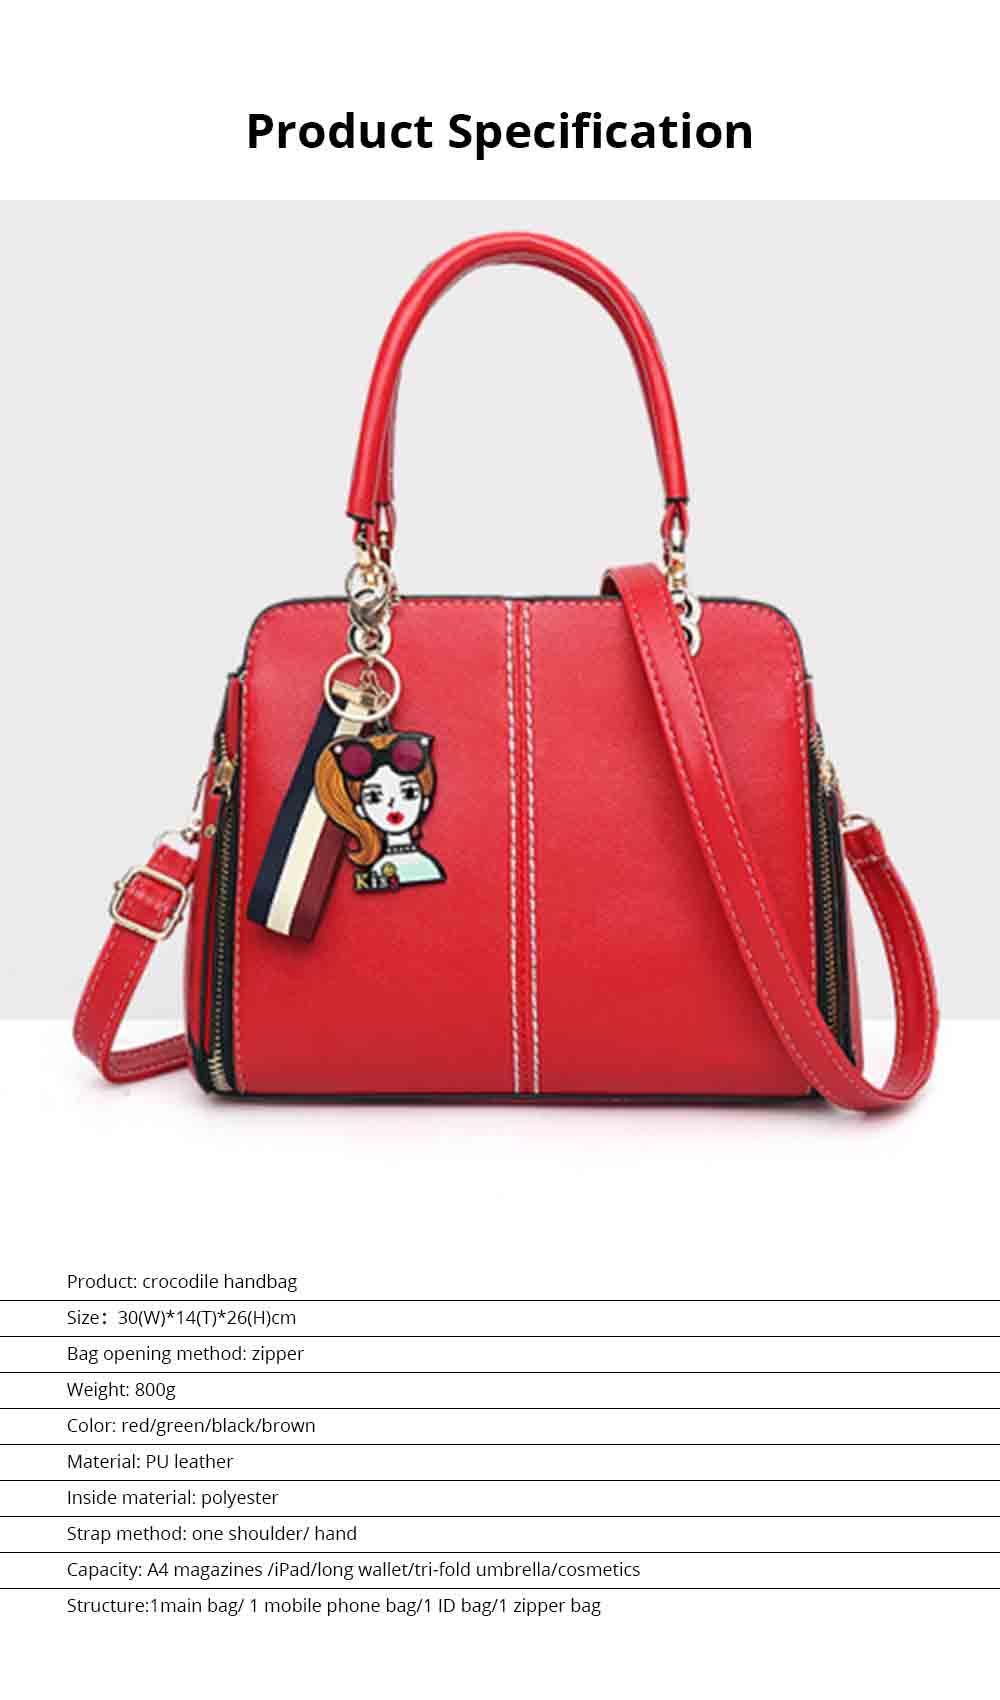 Sewing Bag Handles With High Quality Exquisite Metal Buckle, Simple Elegant One-shoulder Women's Handbag 7